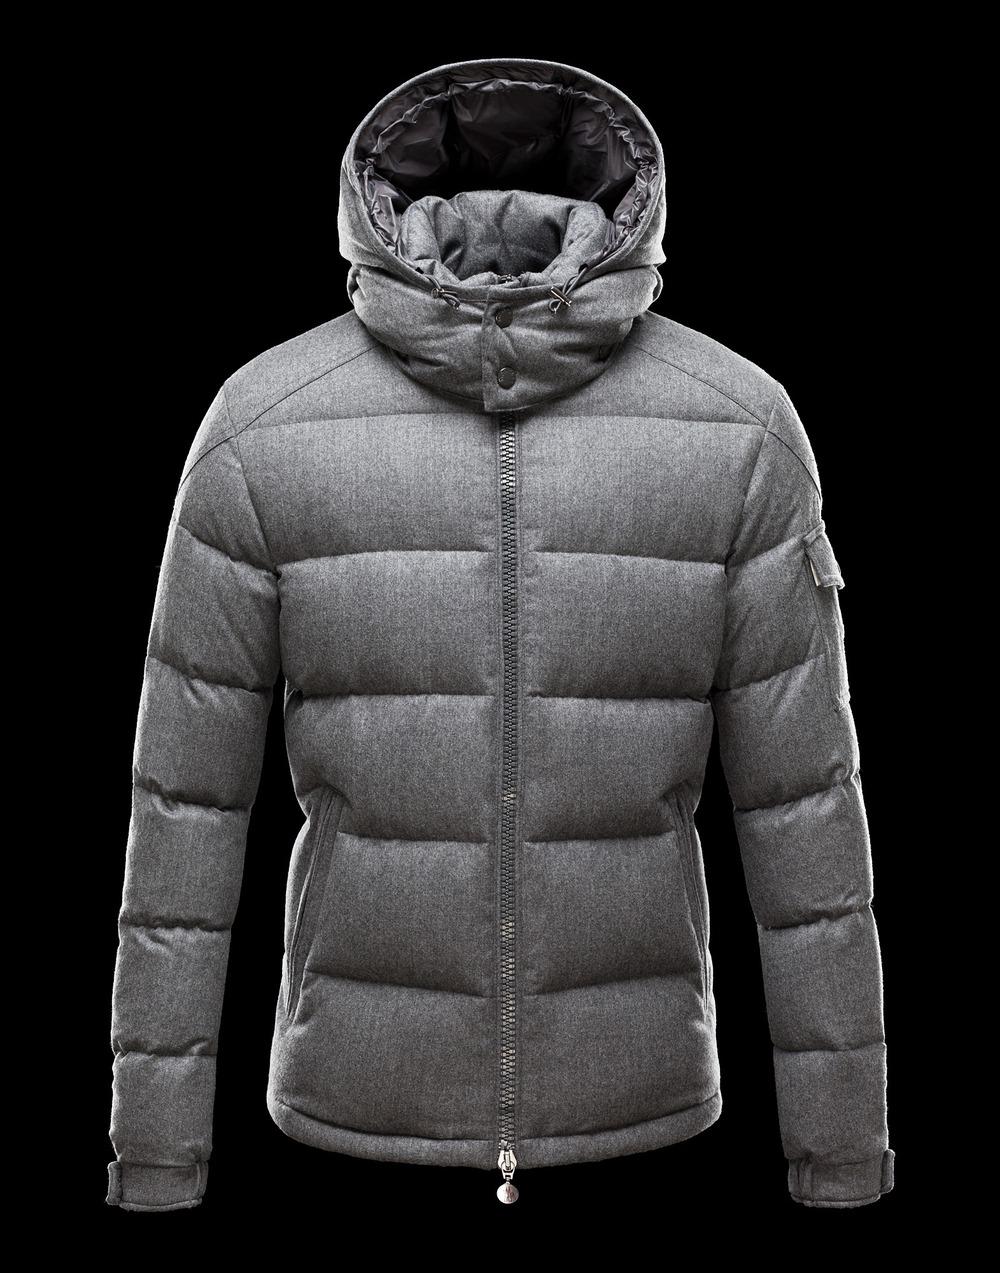 Moncler Montegenvre English flannel down - XL XXL - Size 6 - photo 1 Cheap Moncler  Jacket Moncler 2015 New Womens ... 4d23097f0a